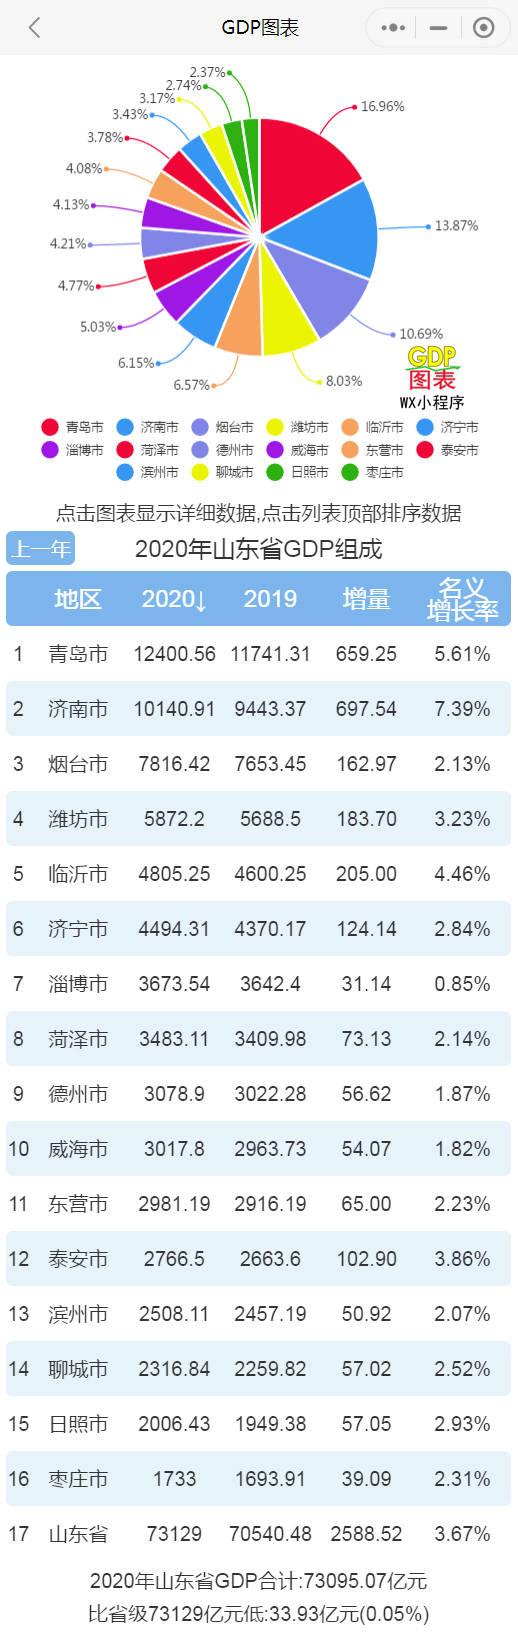 gdpgtp_2020年山东各市GDP排名,青岛位列第一,济南破万亿暂居第二